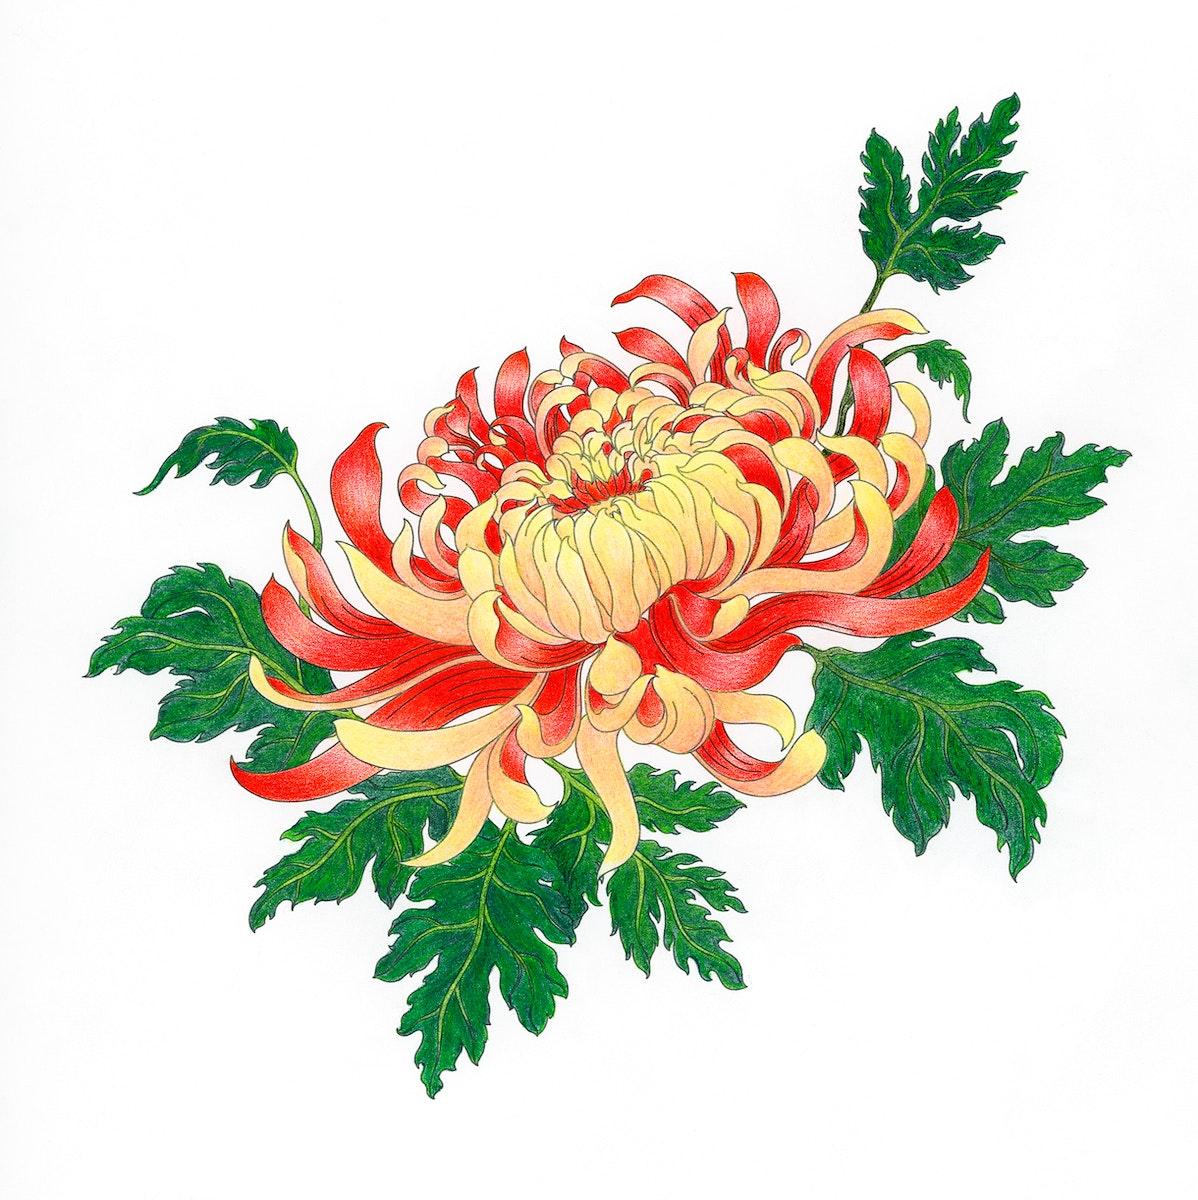 Chrysanthemum flower design adult coloring